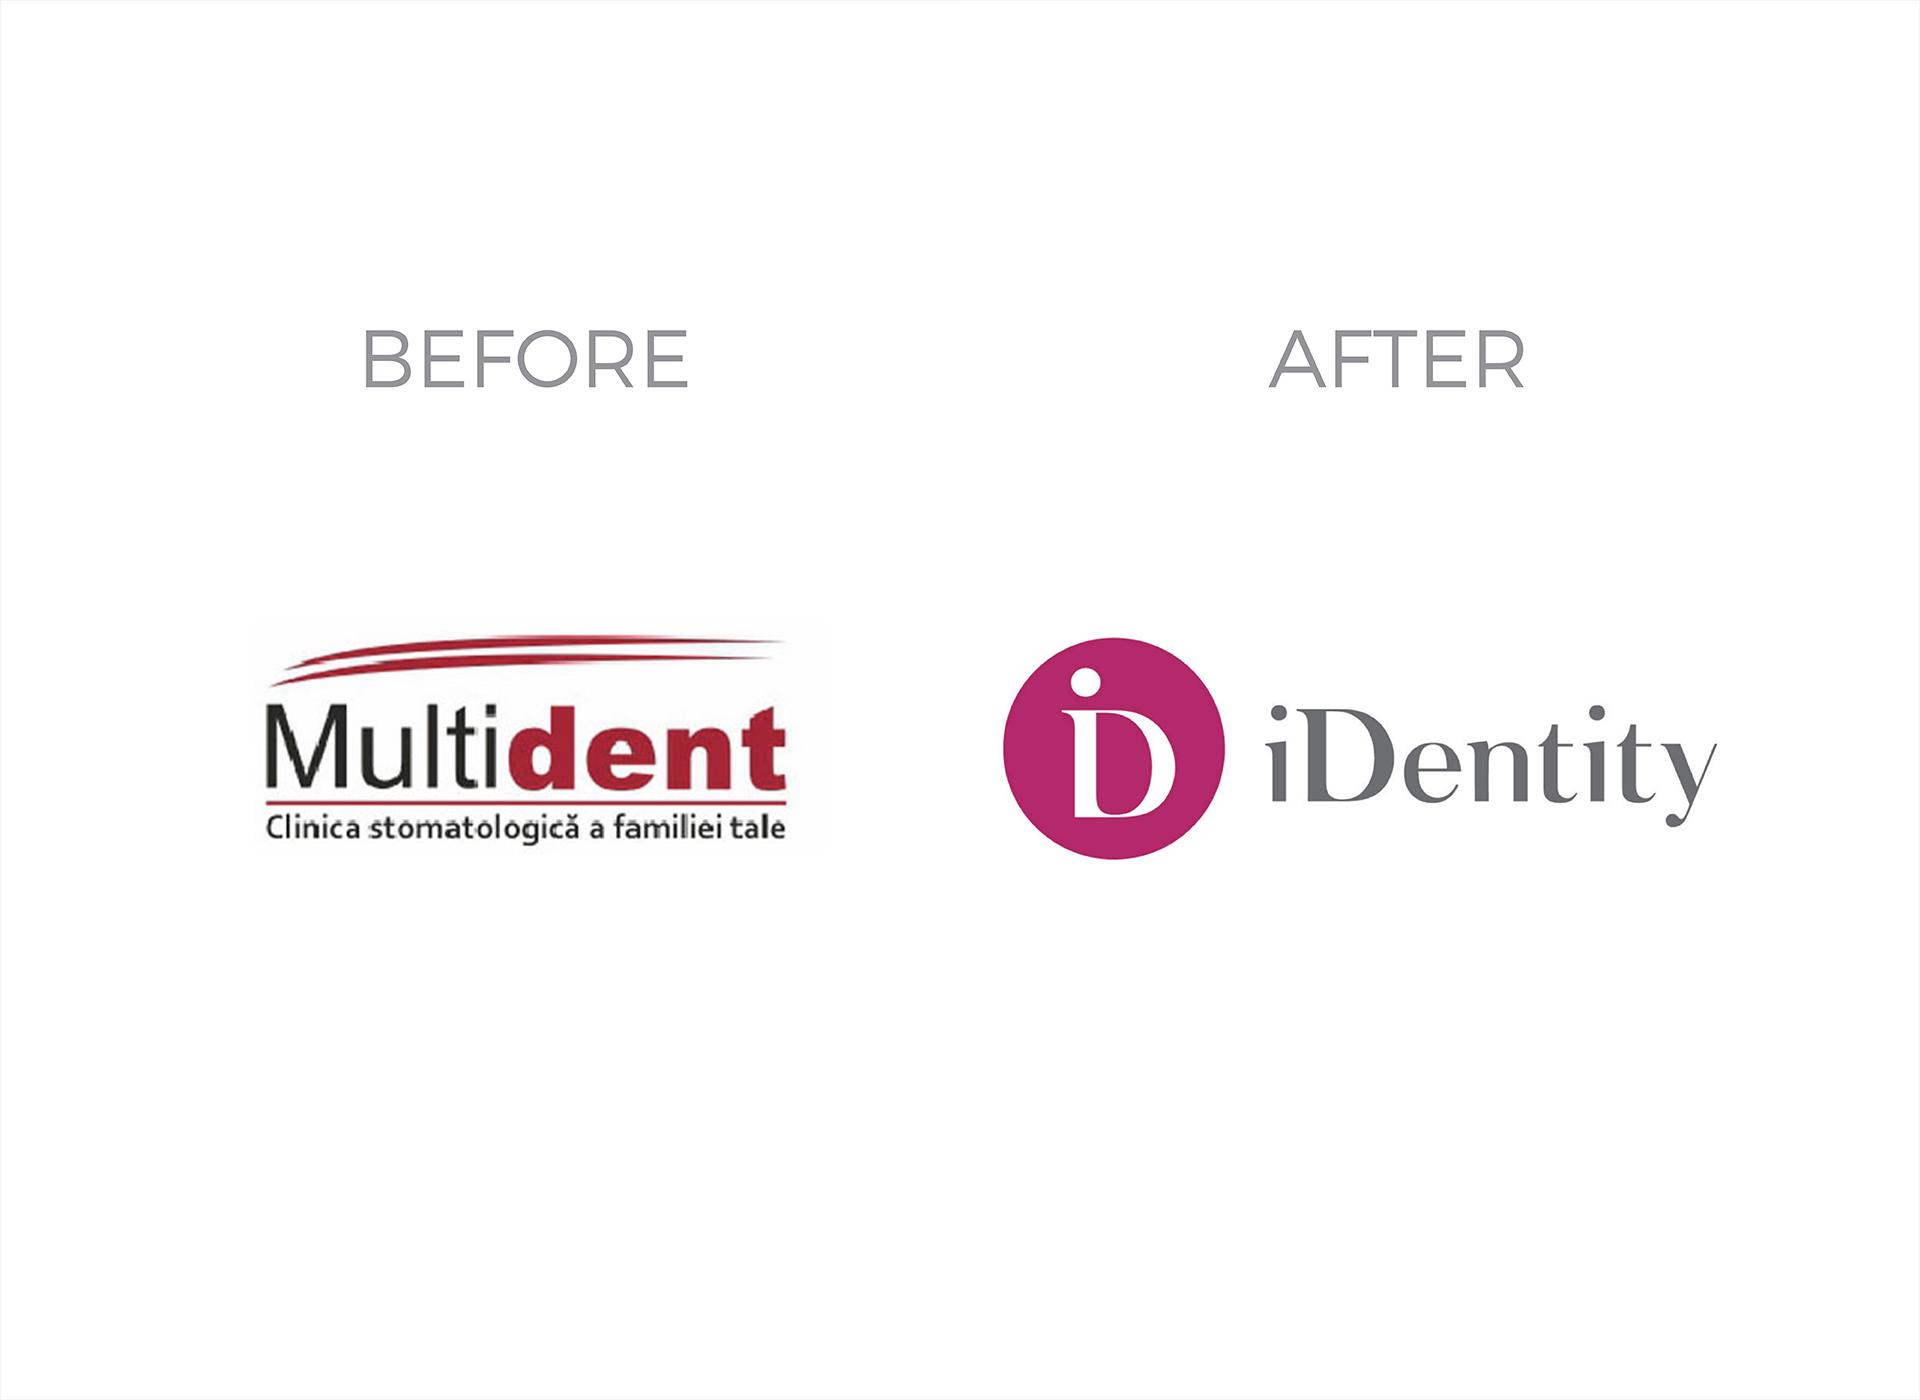 identity portofolio before rebranding